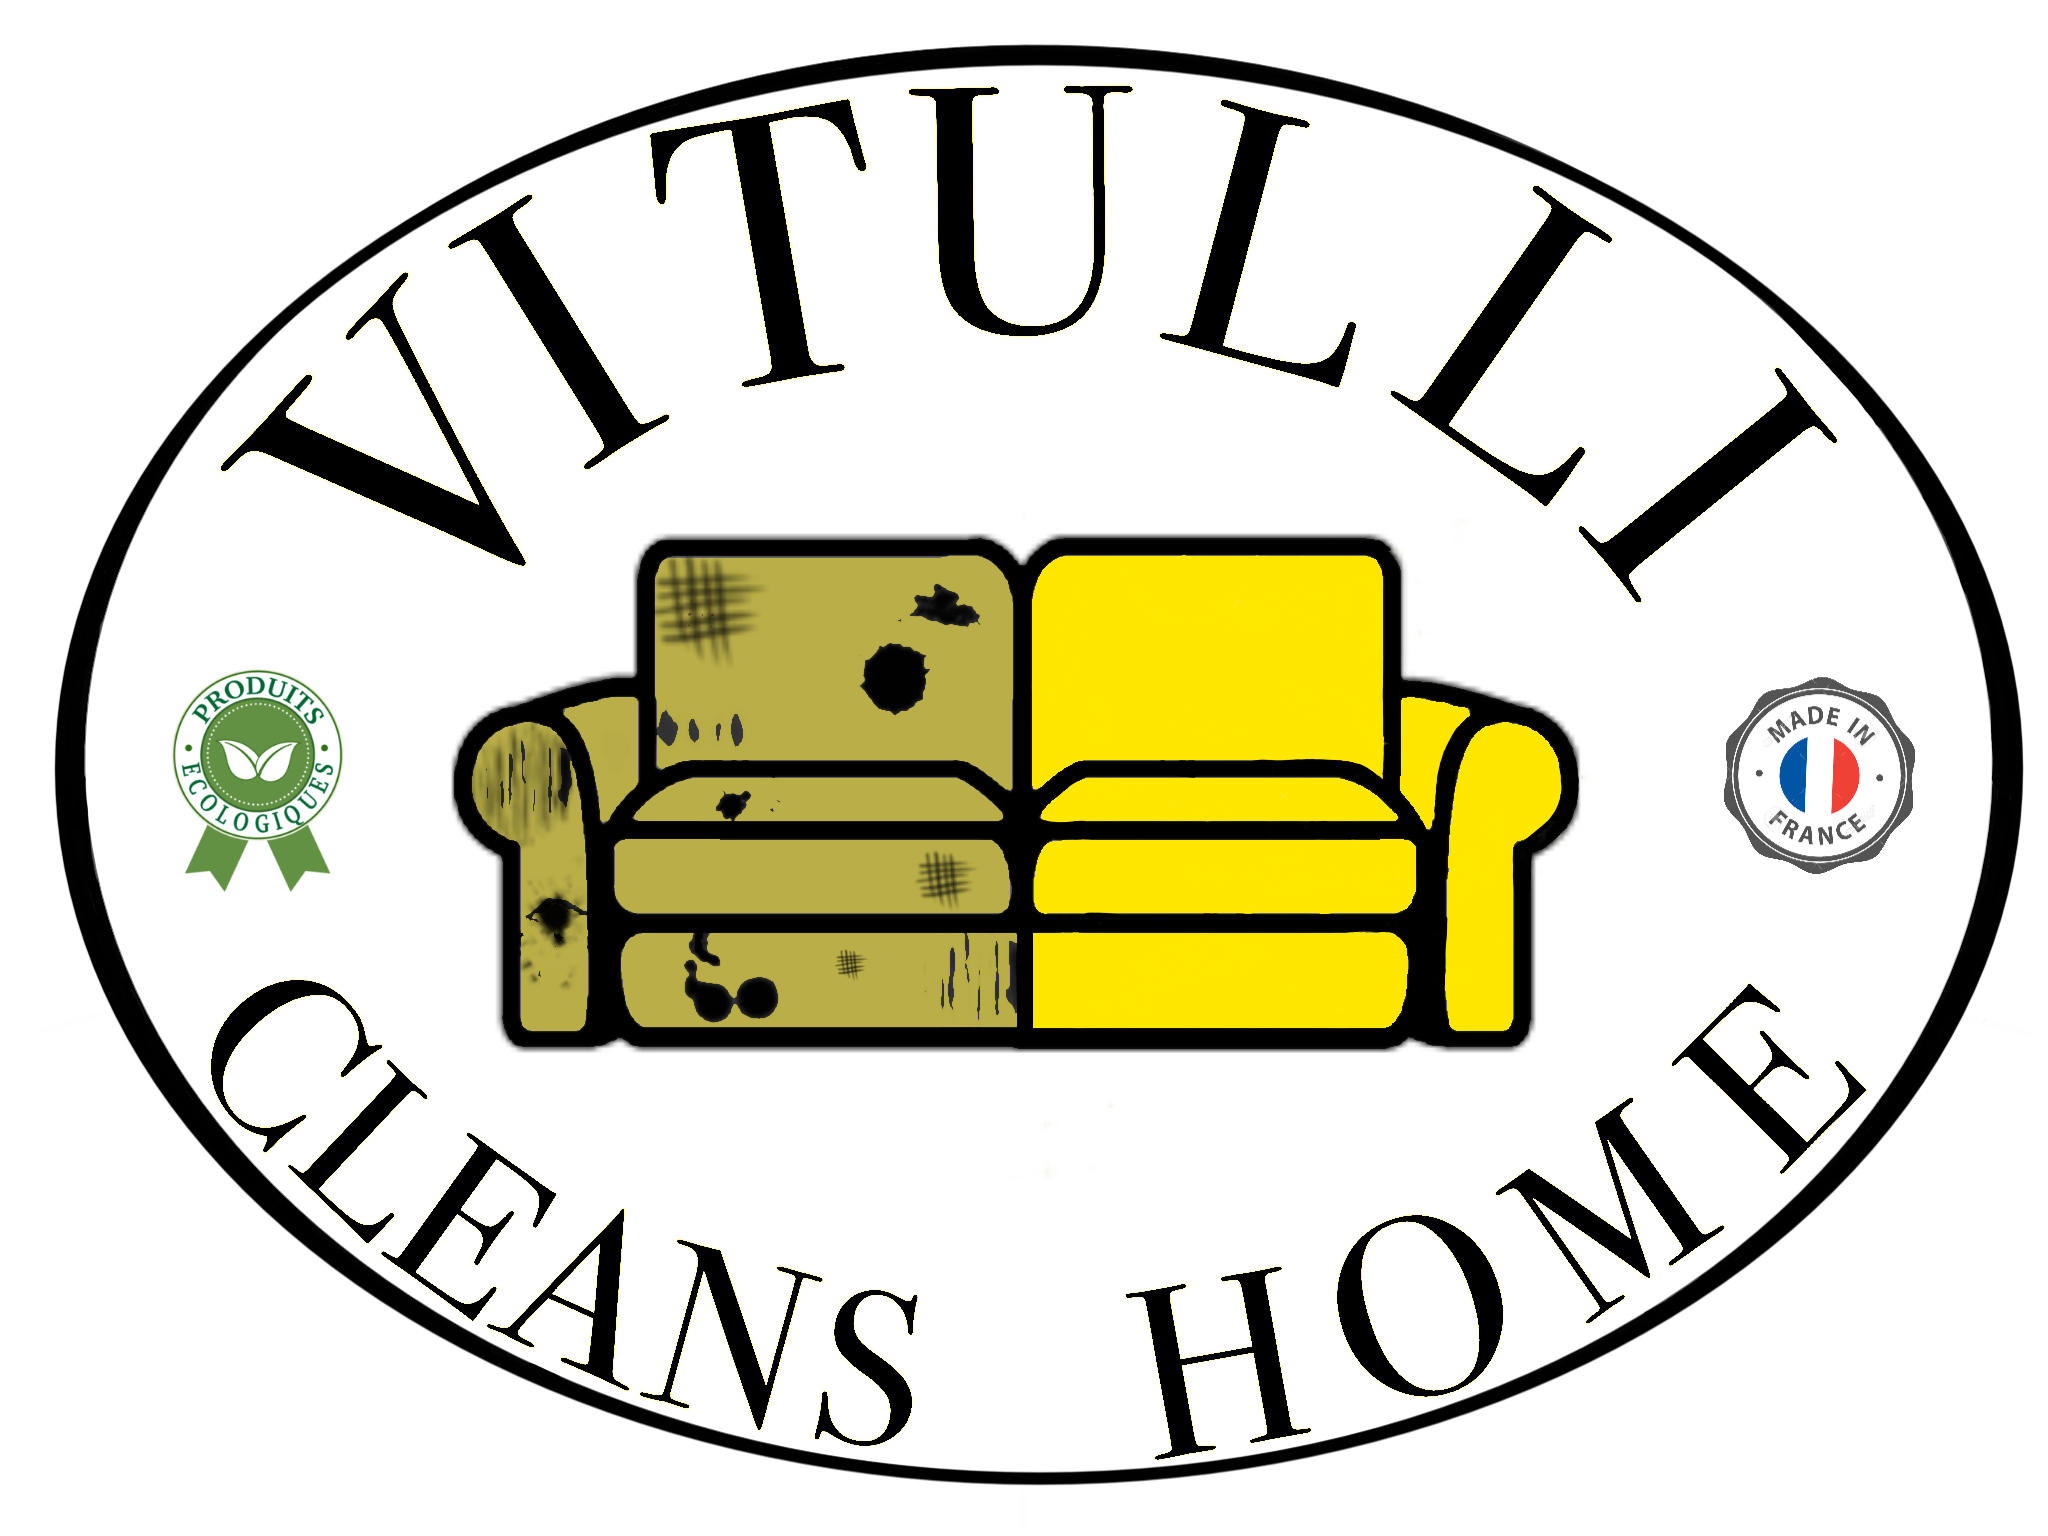 Vitulli cleans home